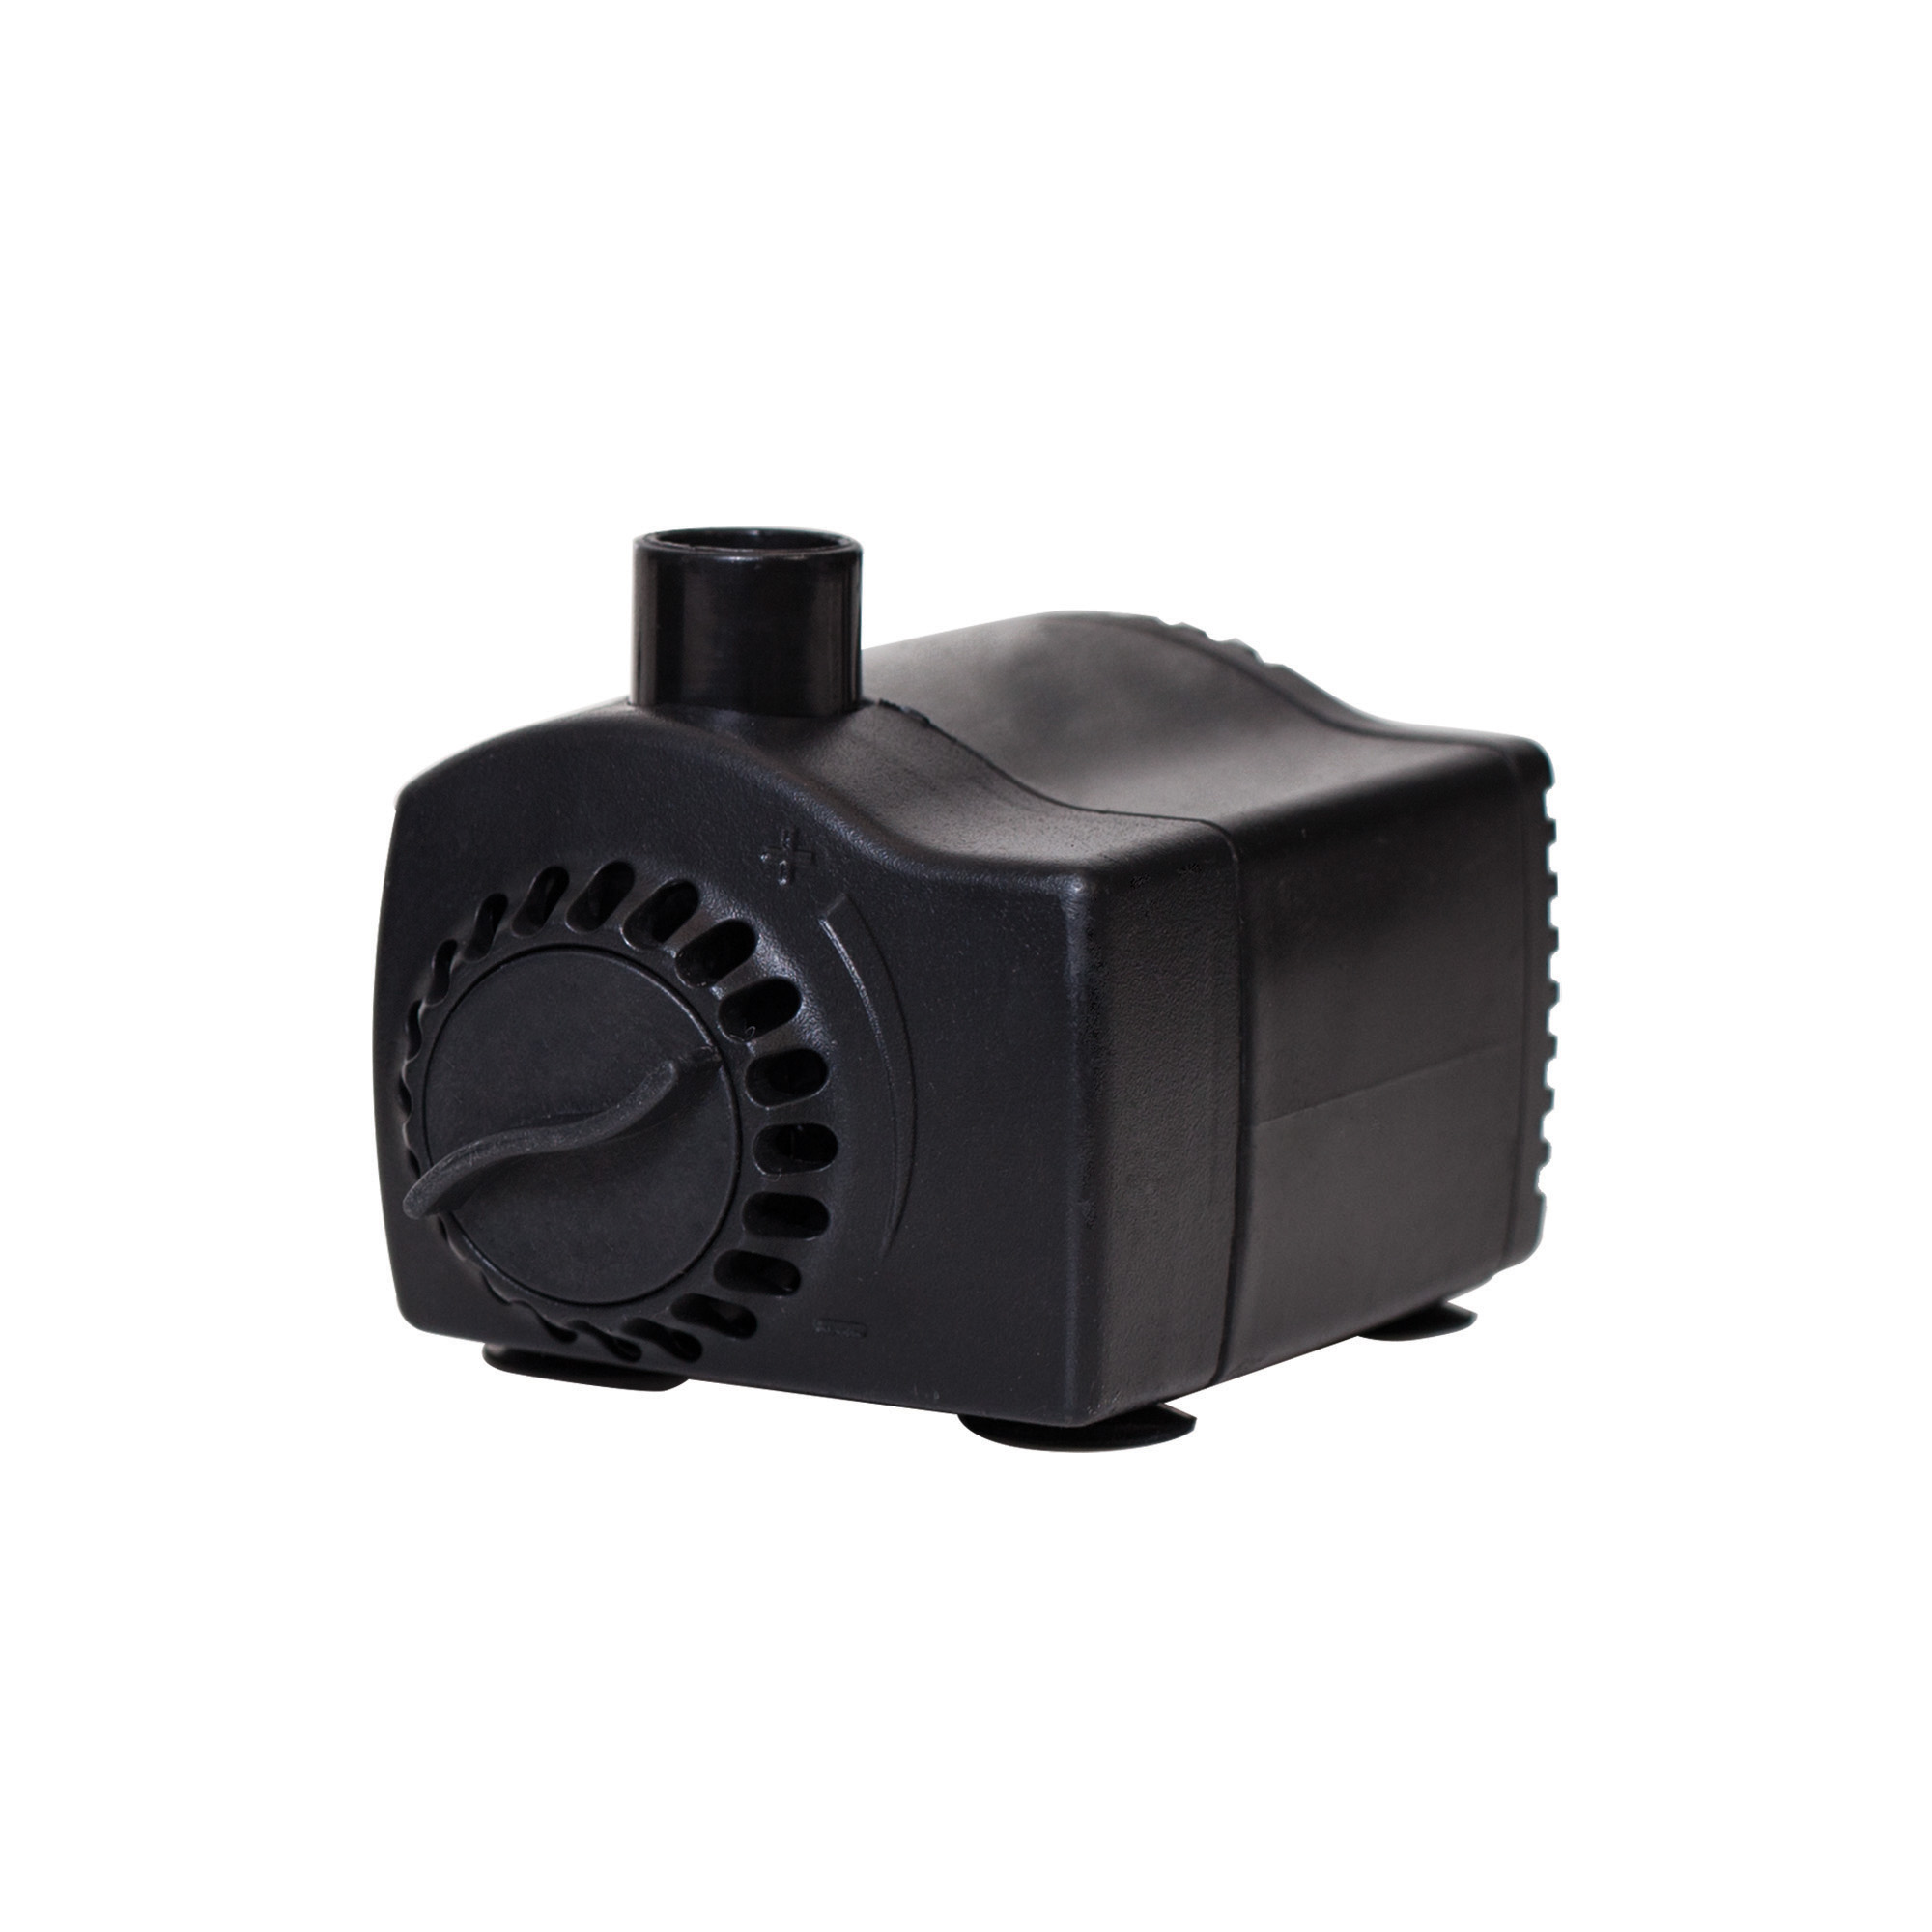 140 GPH Auto Shut-Off Pump